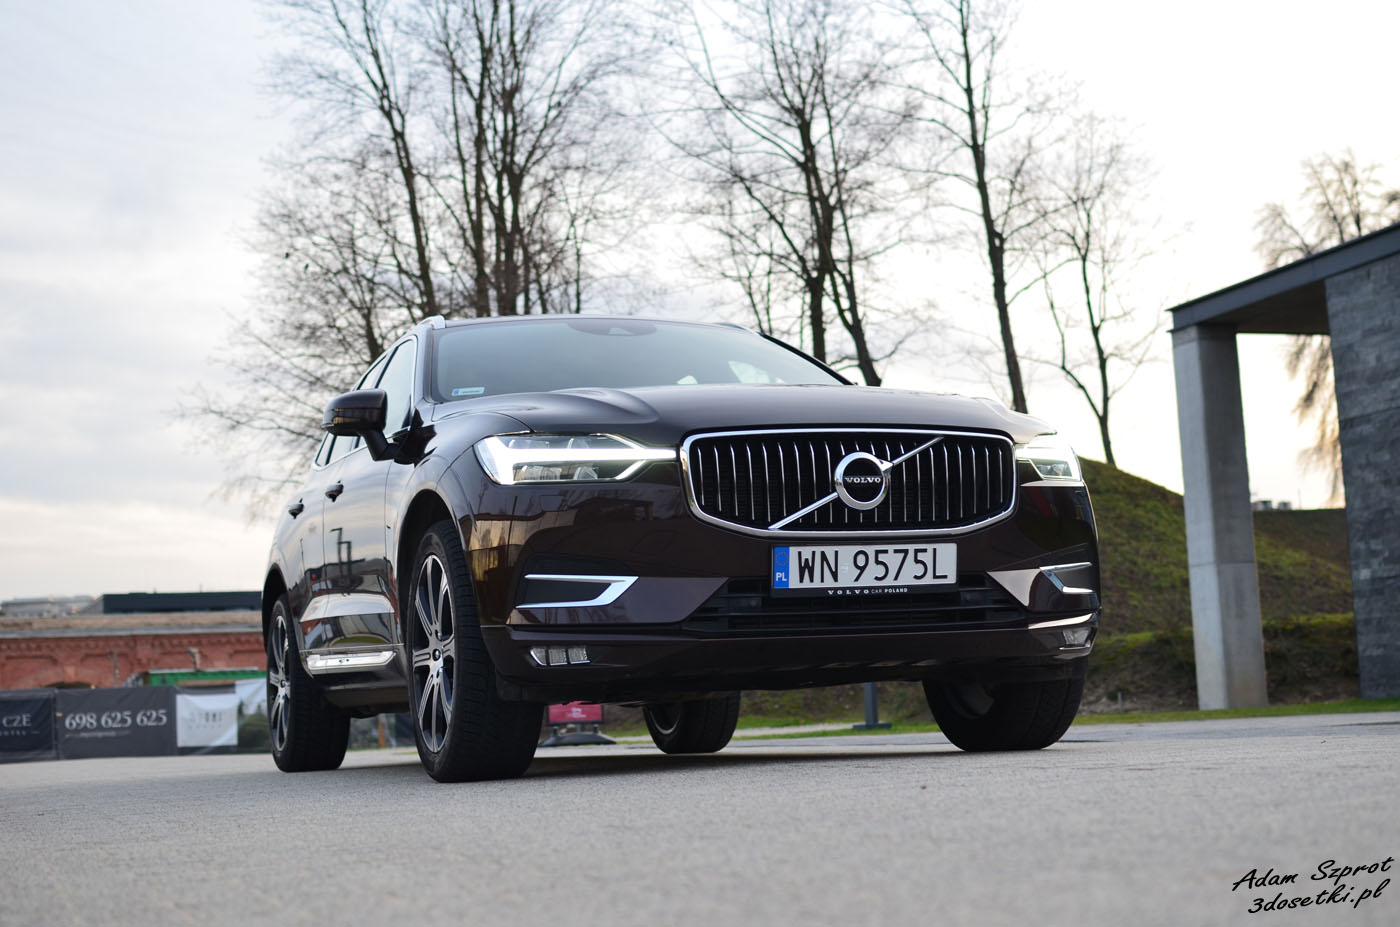 Volvo XC60 Inscription T5 250KM - kompleksowy test